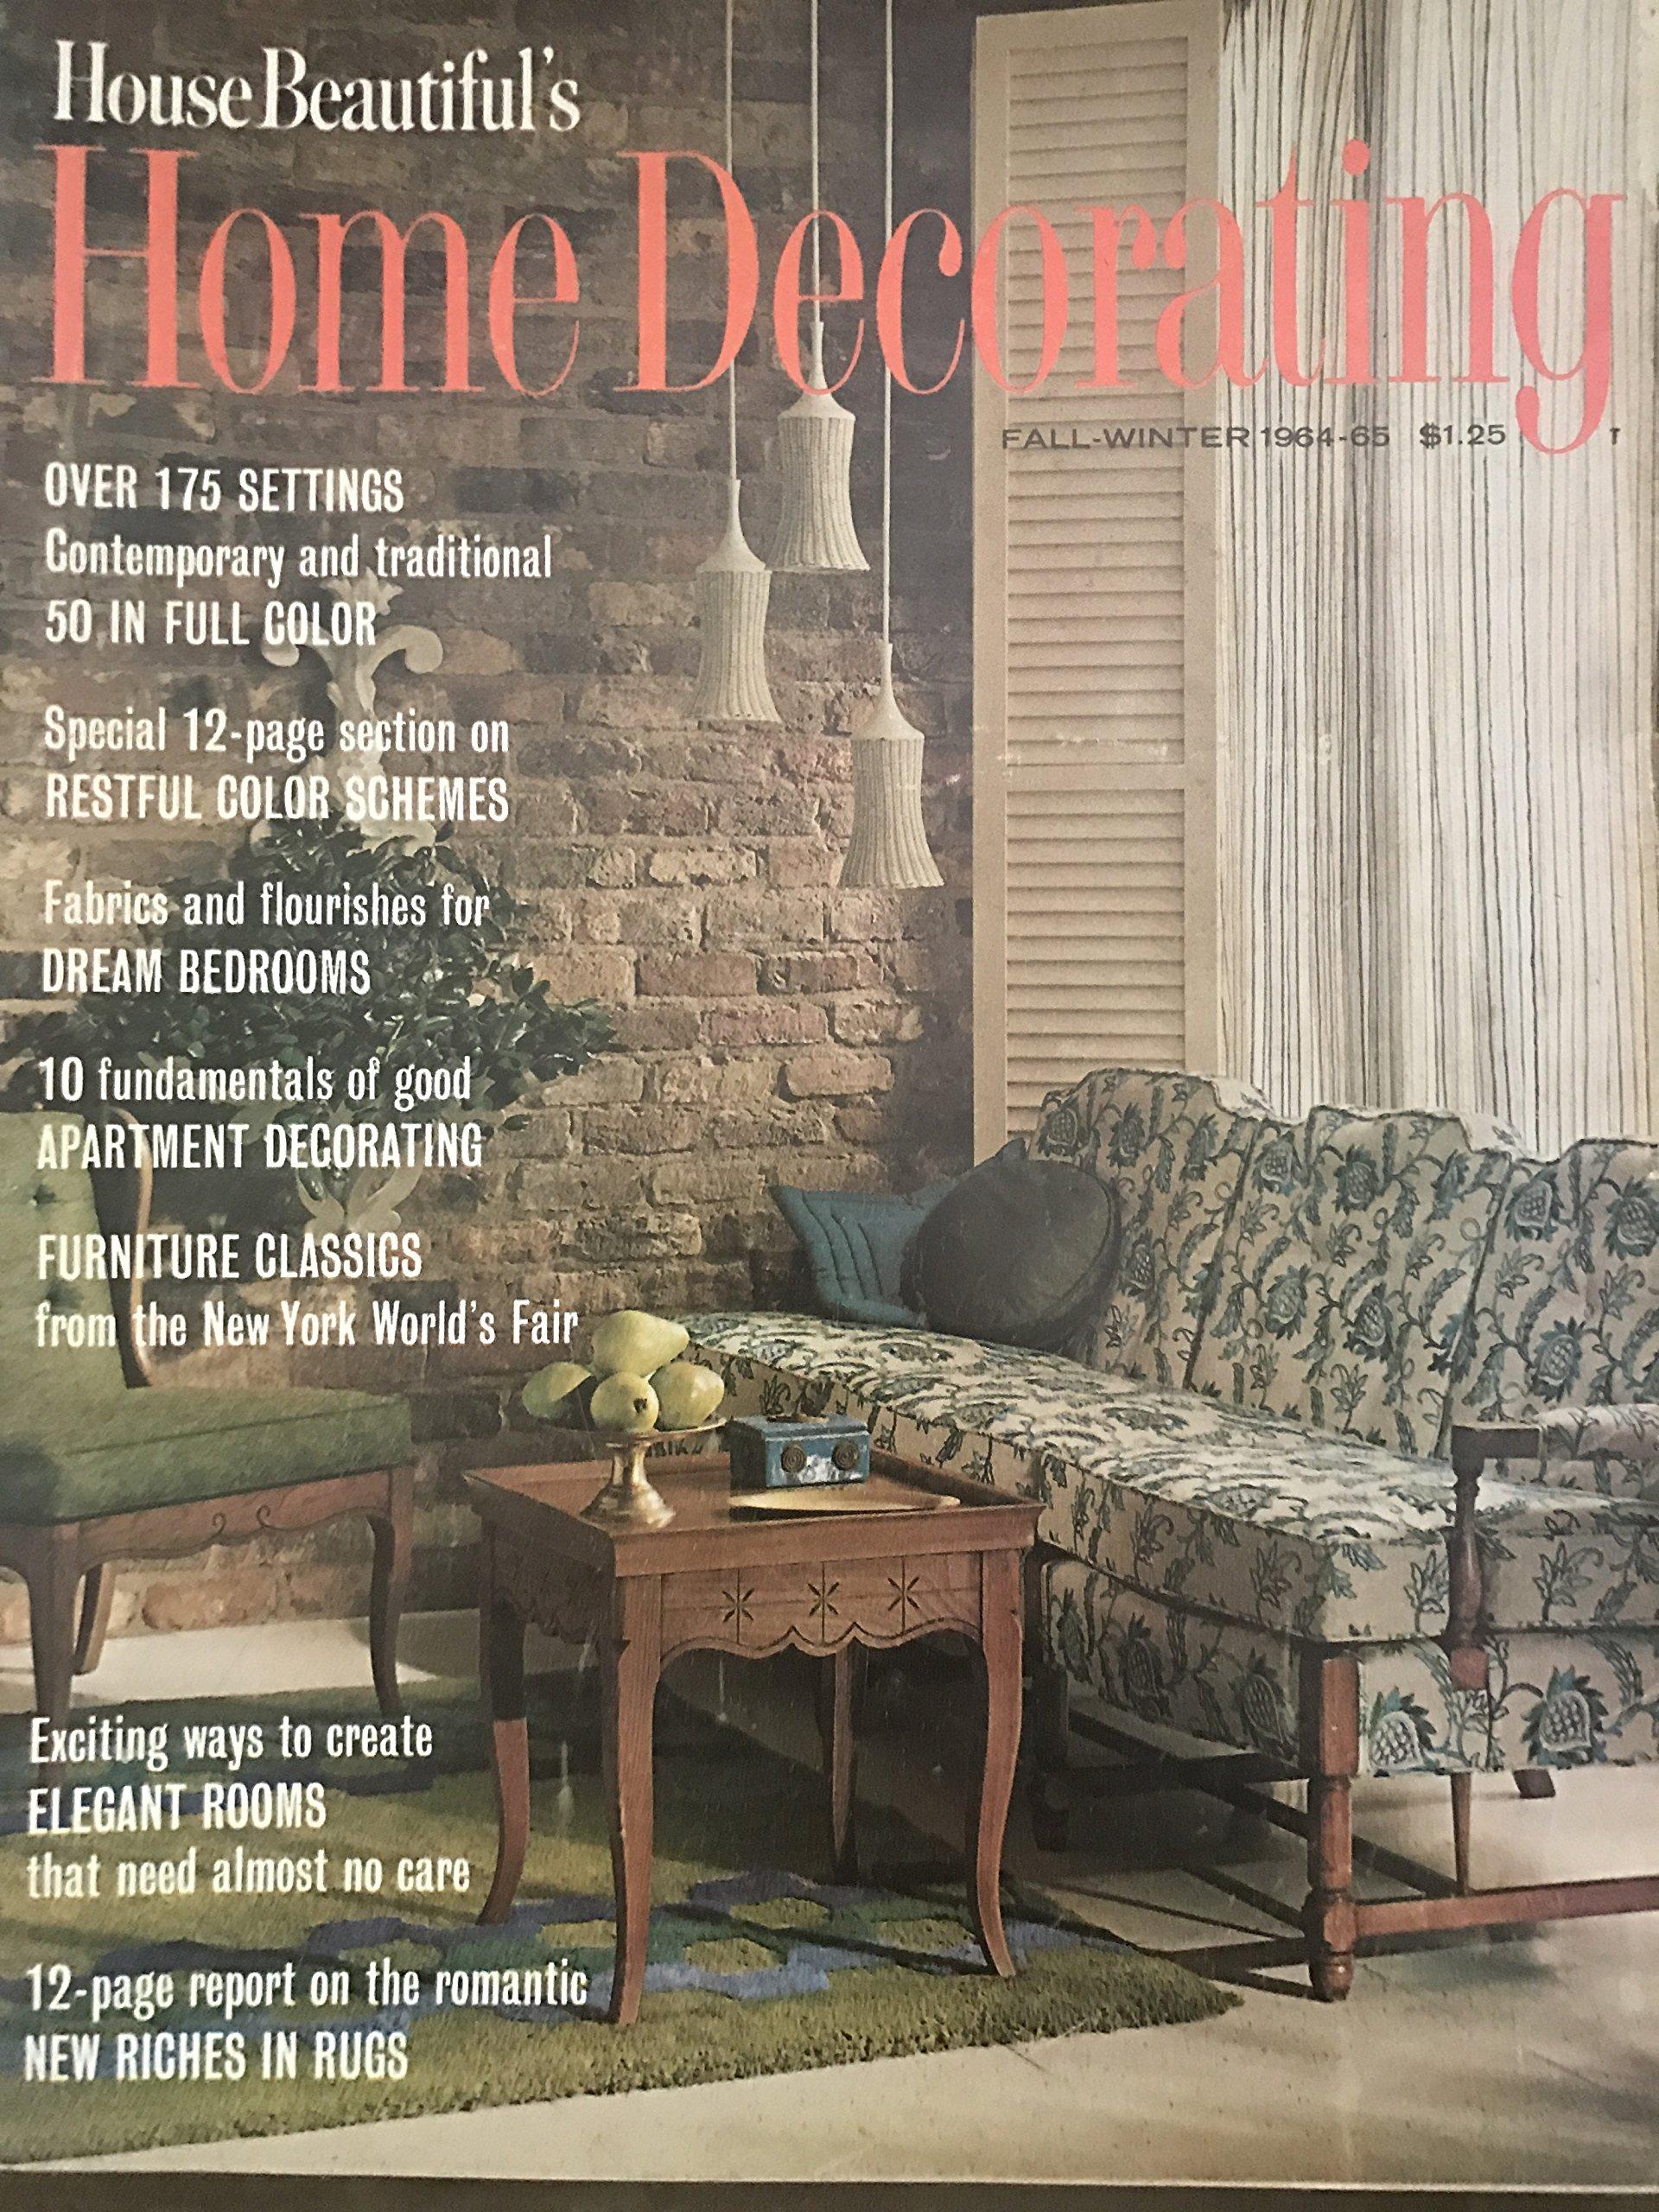 HOUSE BEAUTIFUL HOME DECORATING MAGAZINE FALL 1964/WINTER ...